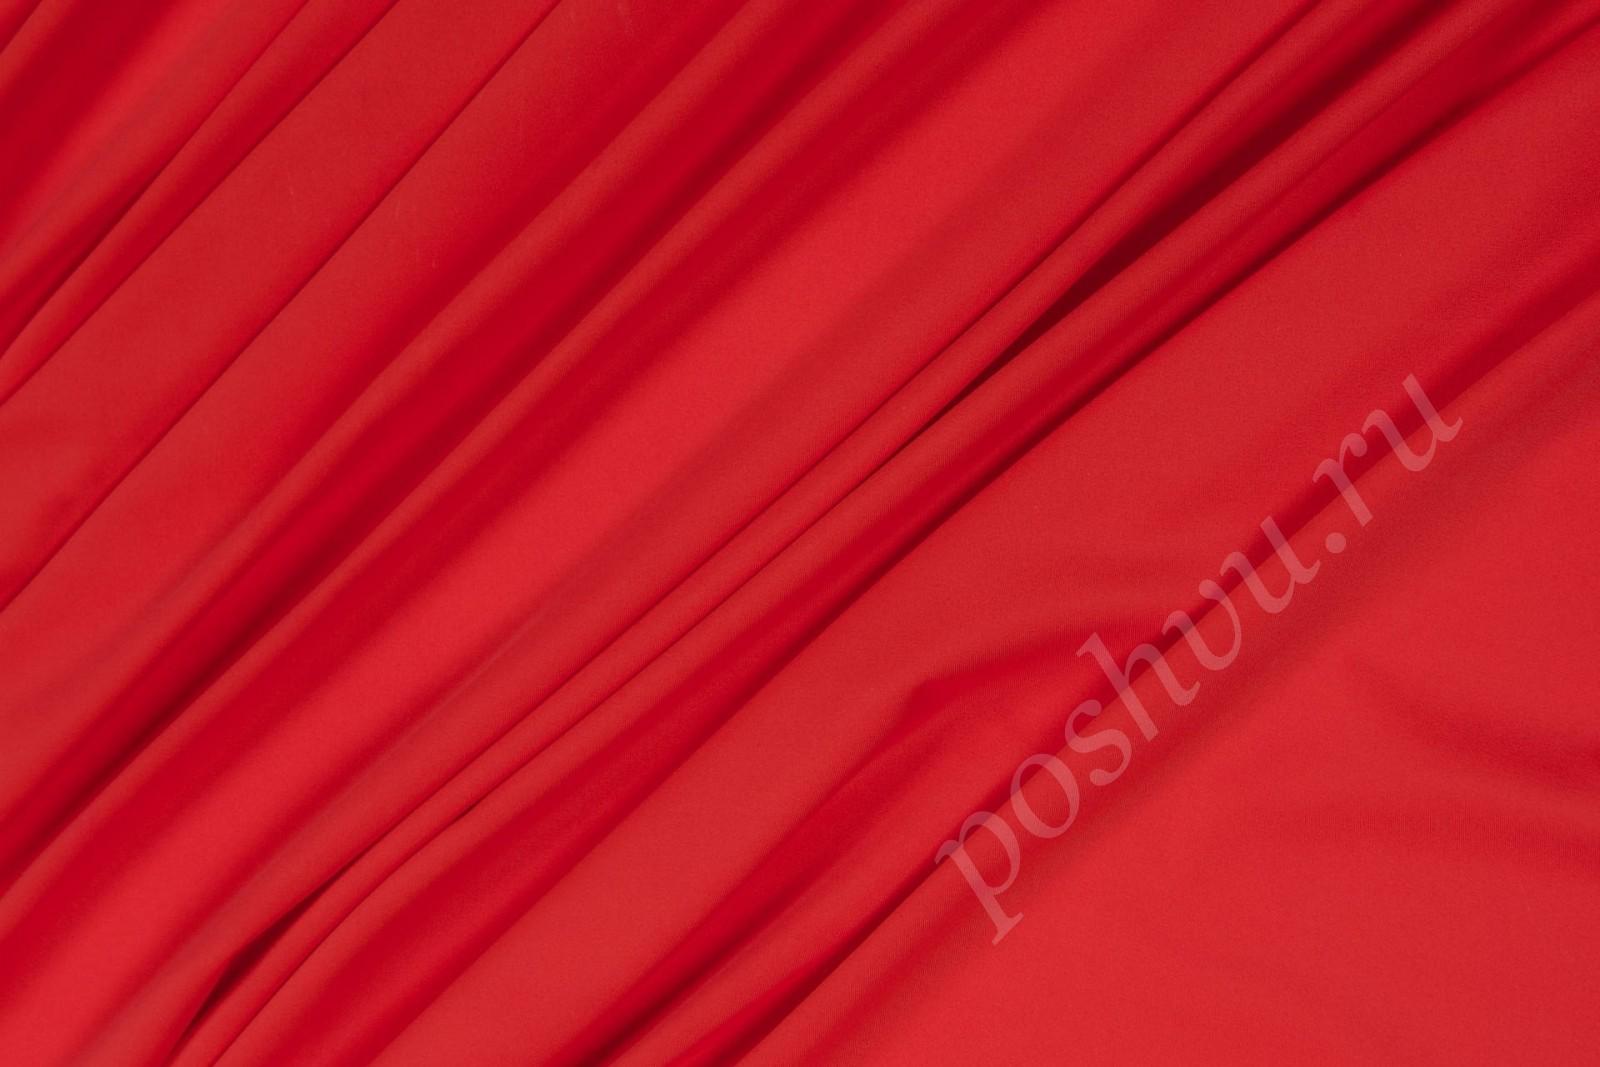 46dd37a613032 Ткань бифлекс матовый красный — купить ткань бифлекс для любого типа ...